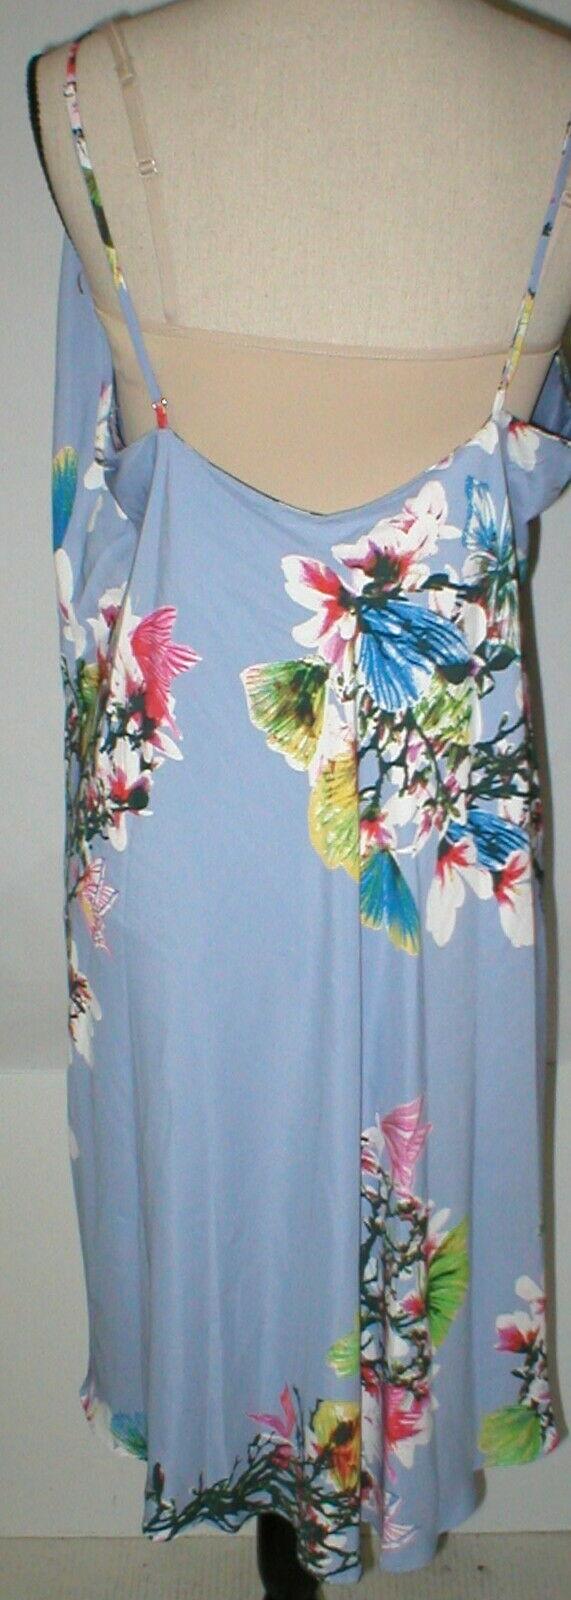 NWT New Designer Natori Womens XL Night Gown Silky Light Blue Pink White Flower image 7